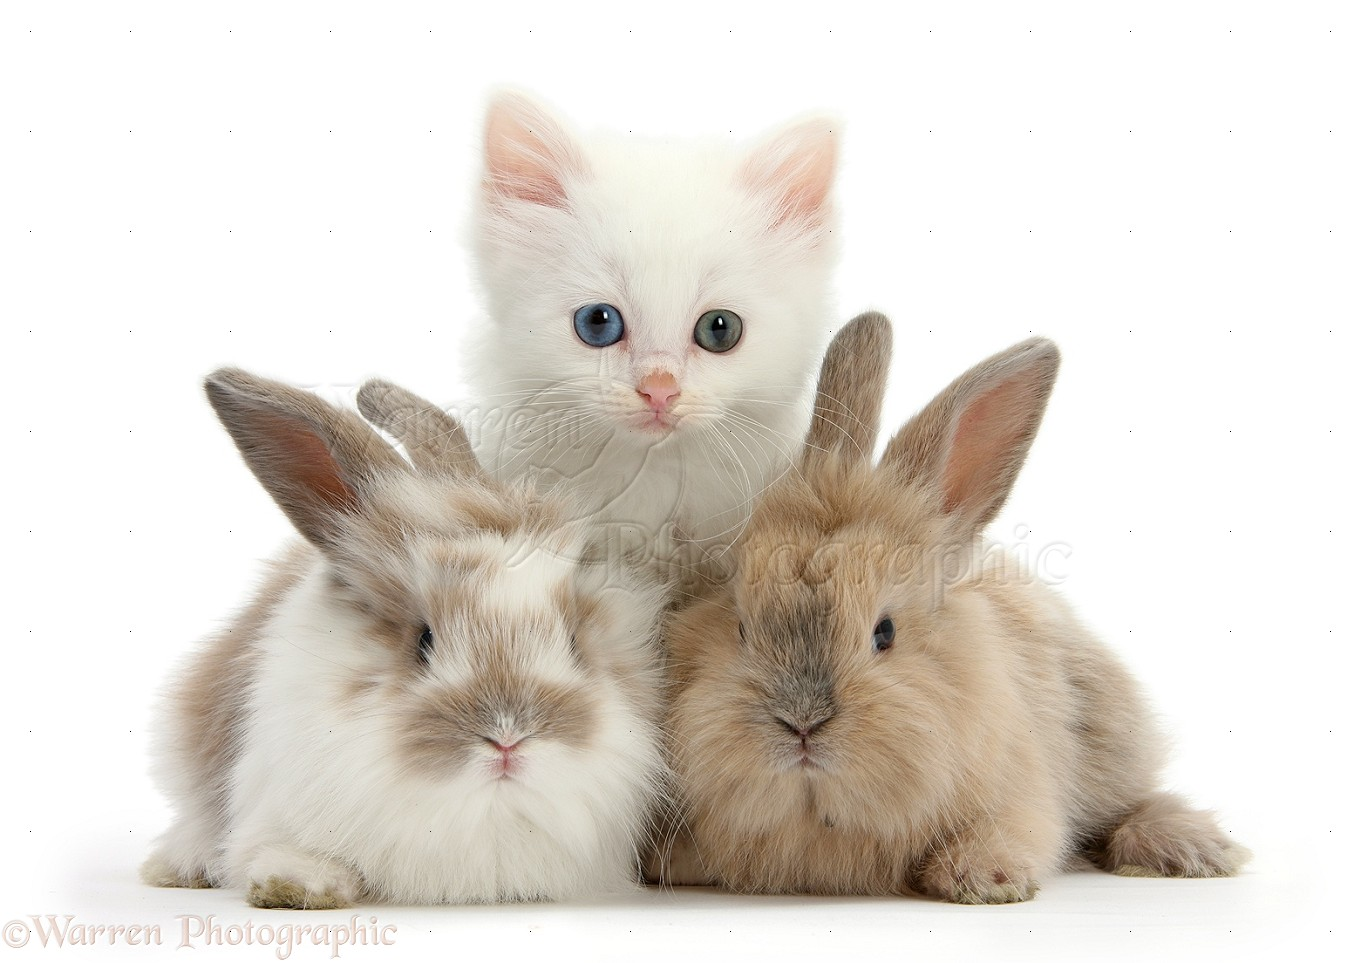 Pets: White kitten and baby rabbits photo WP29031